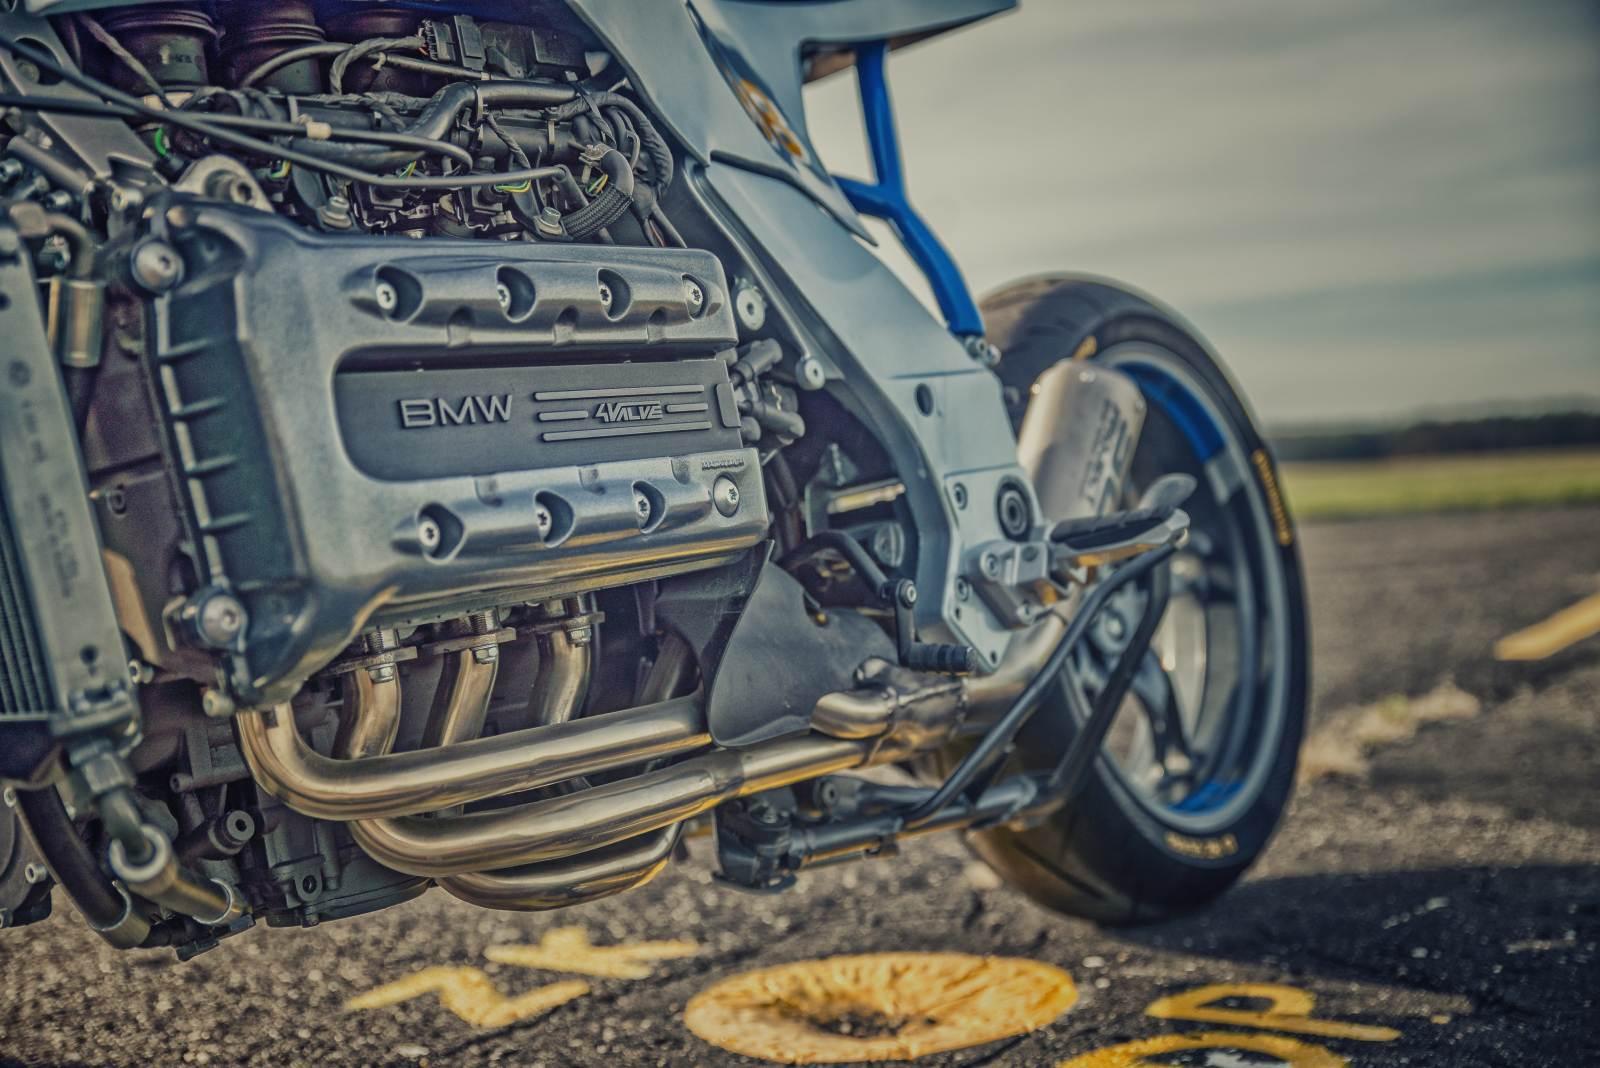 BMW K1200RS - Ugly Motors